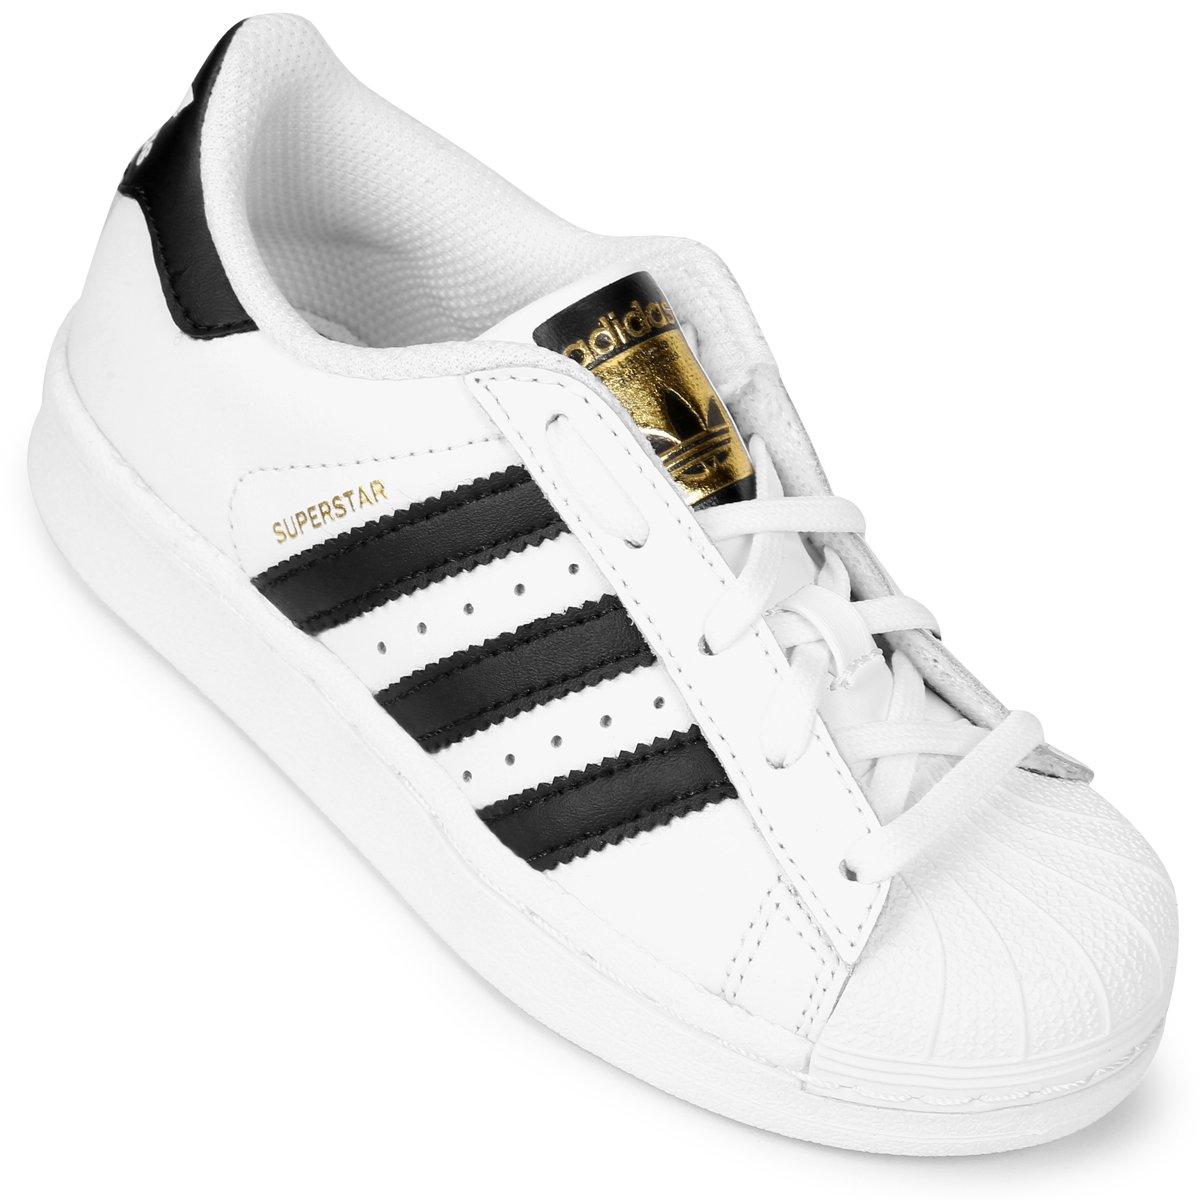 a02fc1e4246 ... new style tênis adidas superstar foundation el infantil brancopreto  8a389 33ba0 inexpensive tênis adidas superstar foundation branco e preto ...